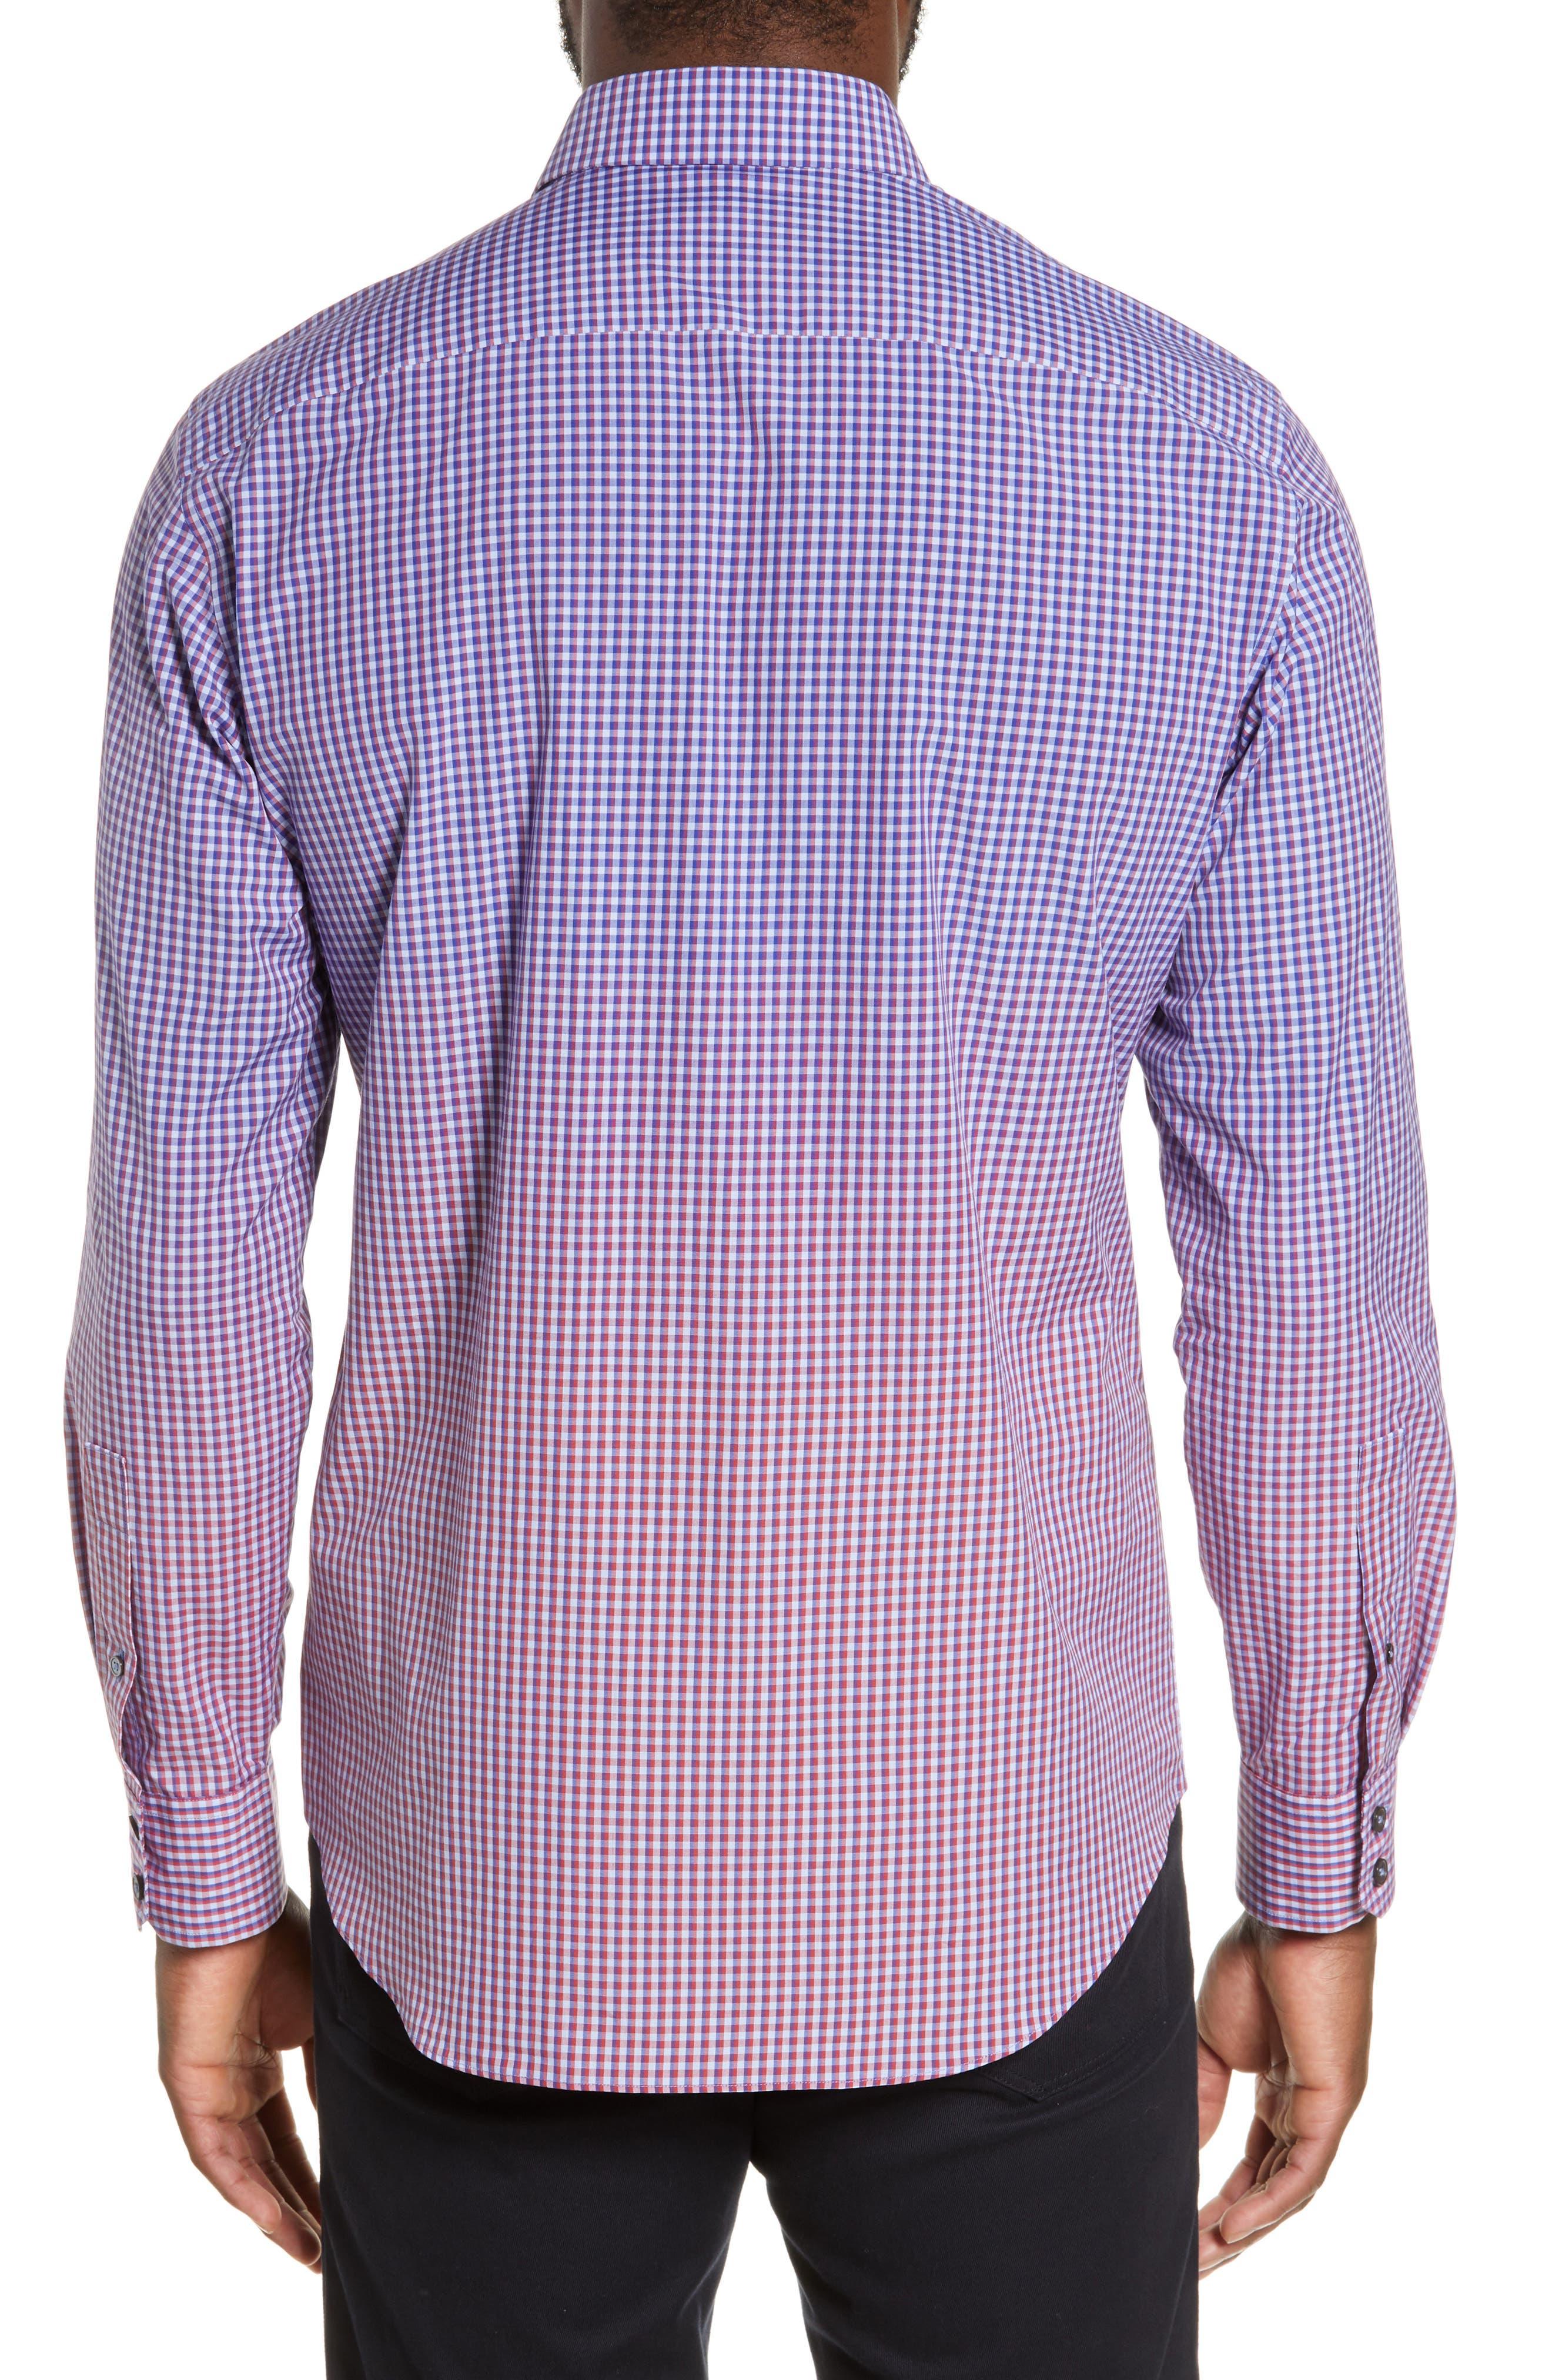 ZACHARY PRELL, Germain Regular Fit Gradient Check Sport Shirt, Alternate thumbnail 3, color, RED